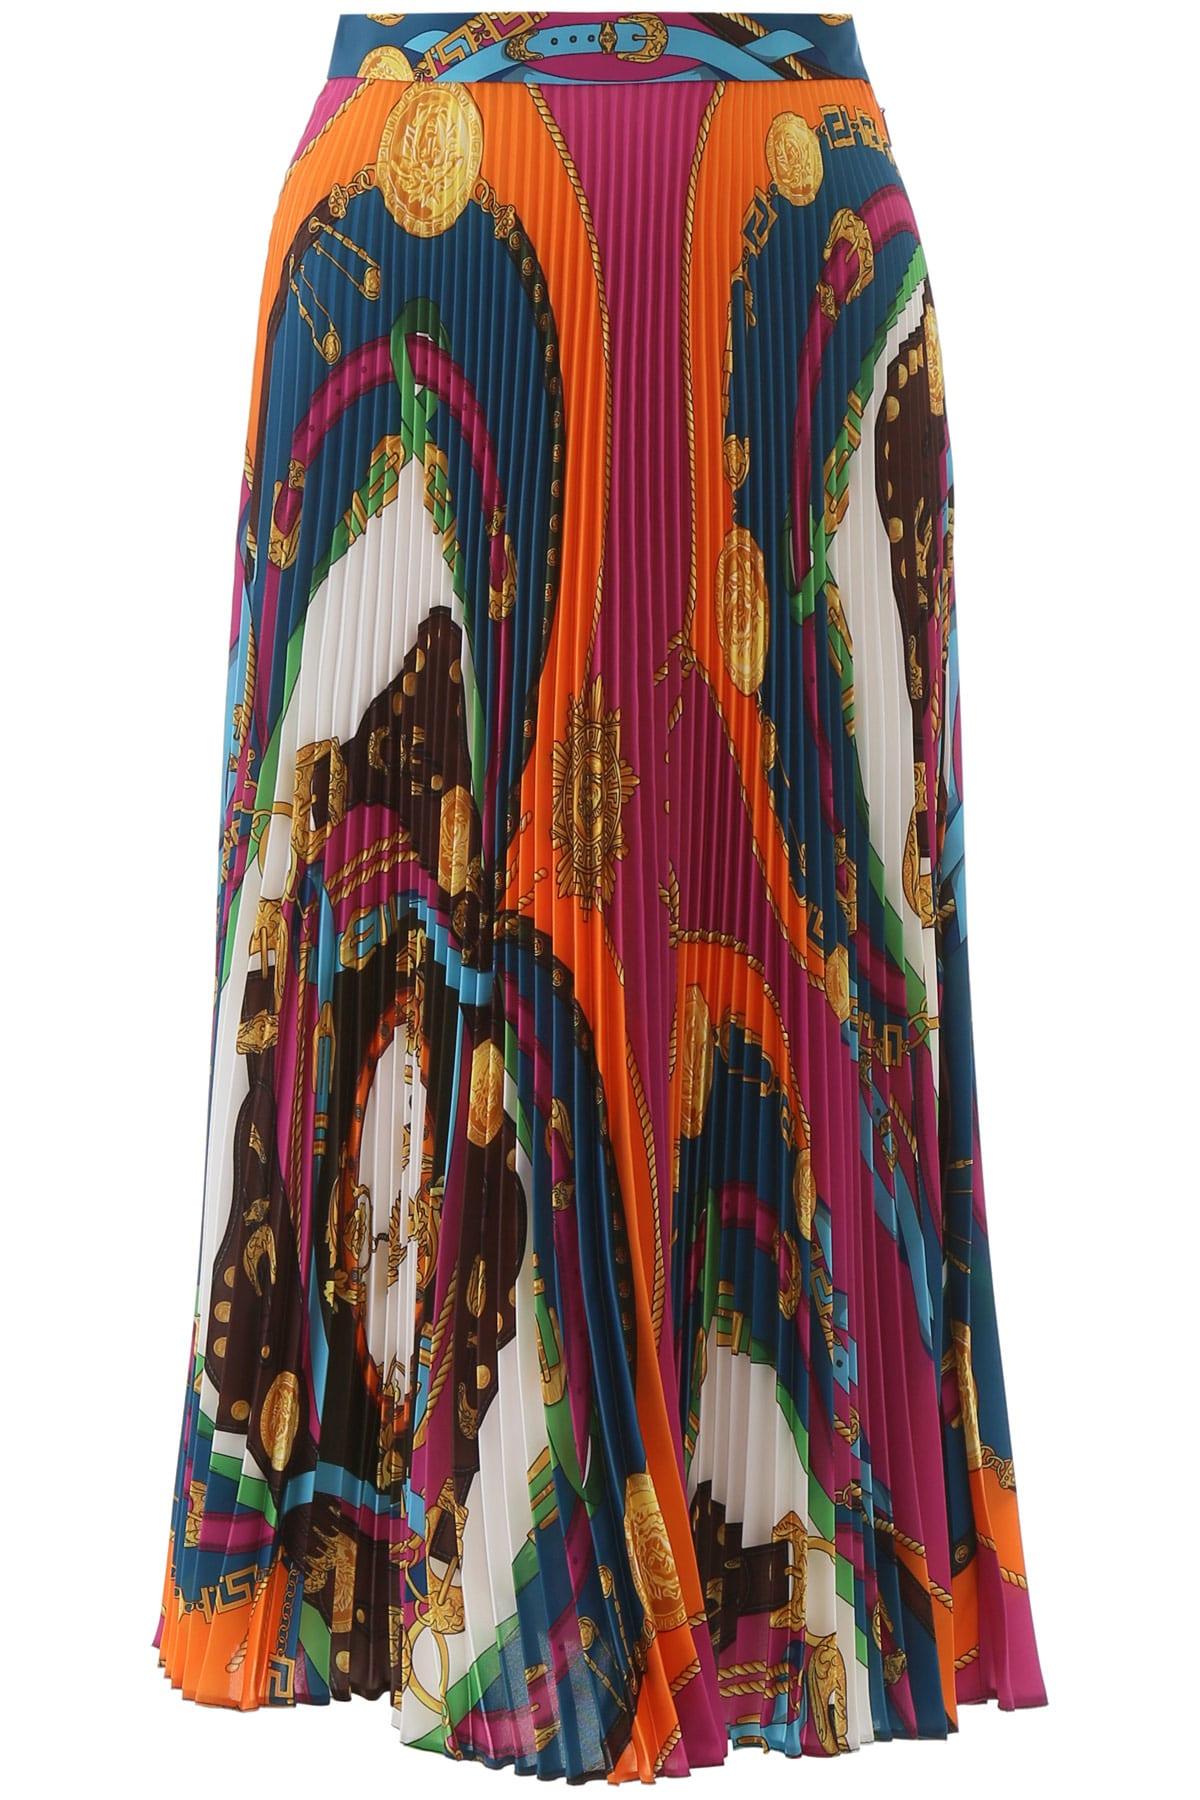 Versace Skirts BAROCCO RODEO PRINT PLEATED SKIRT